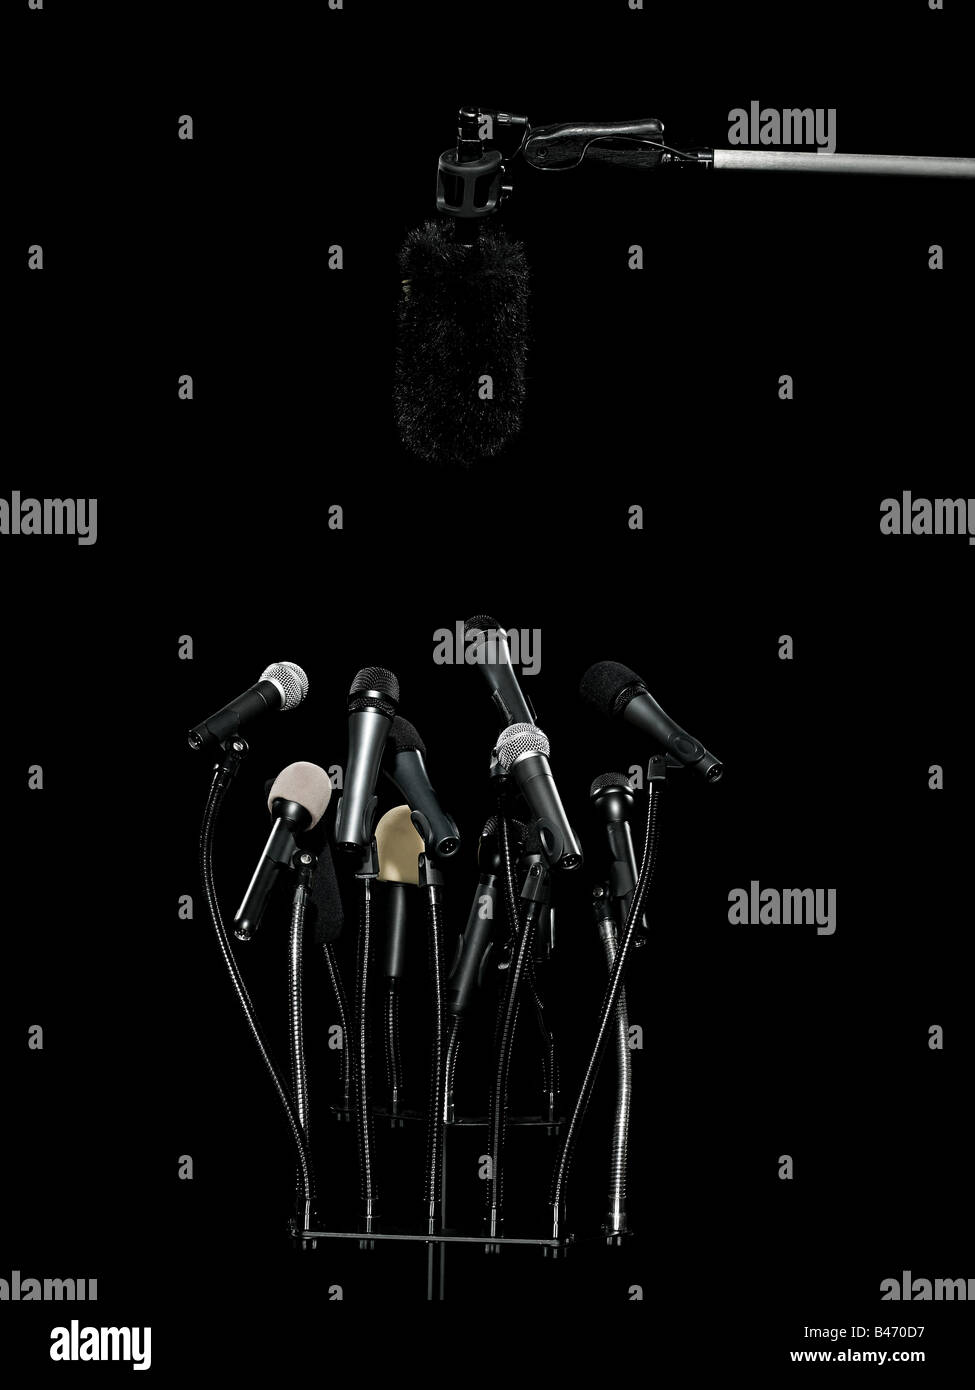 Microphones - Stock Image